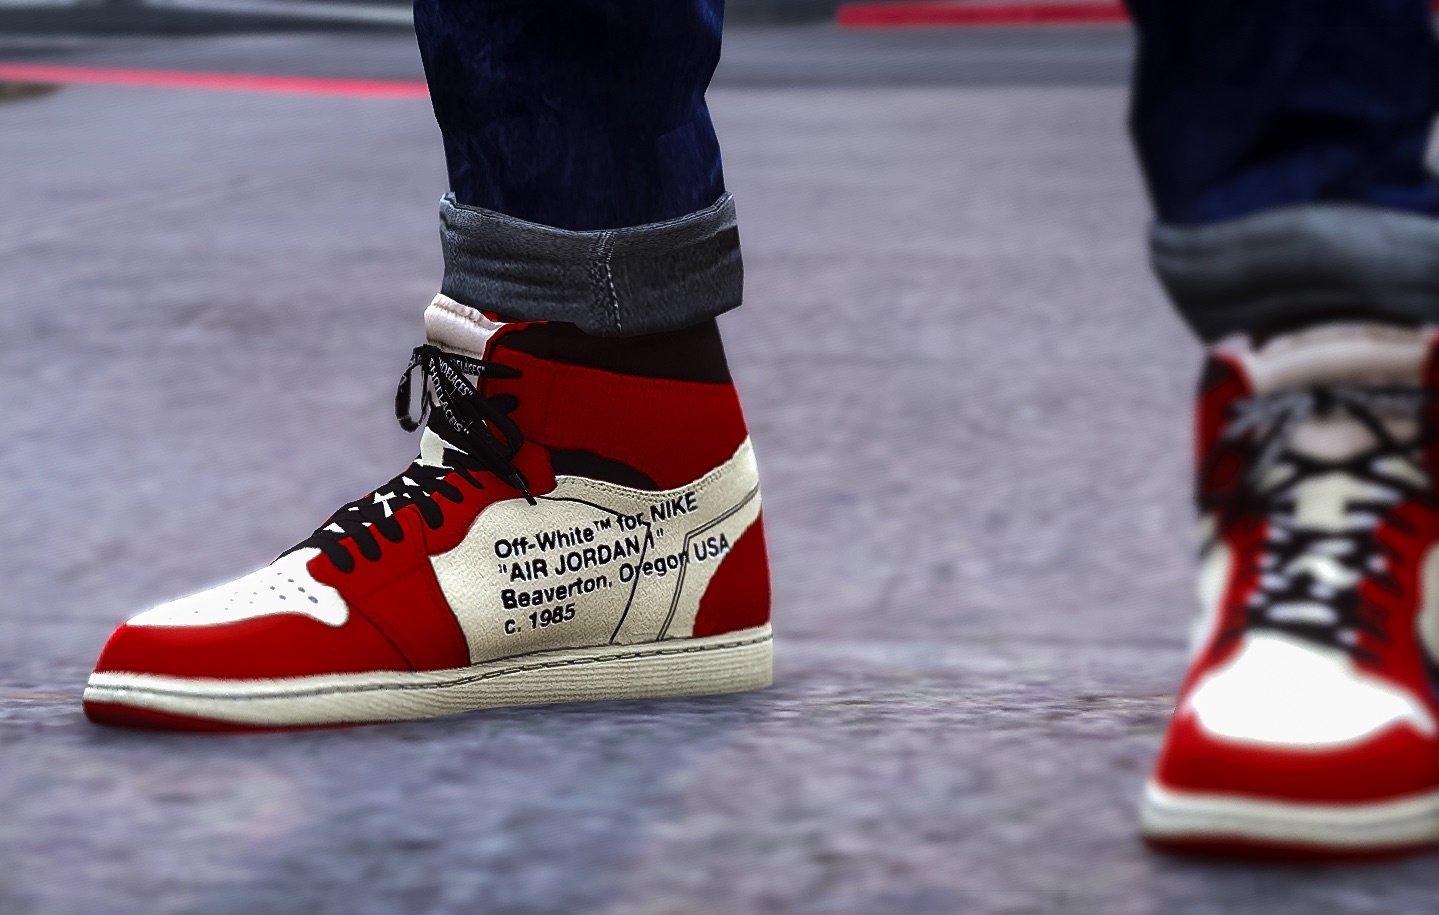 Resultado de imagen para Off-White X Air Jordan 1